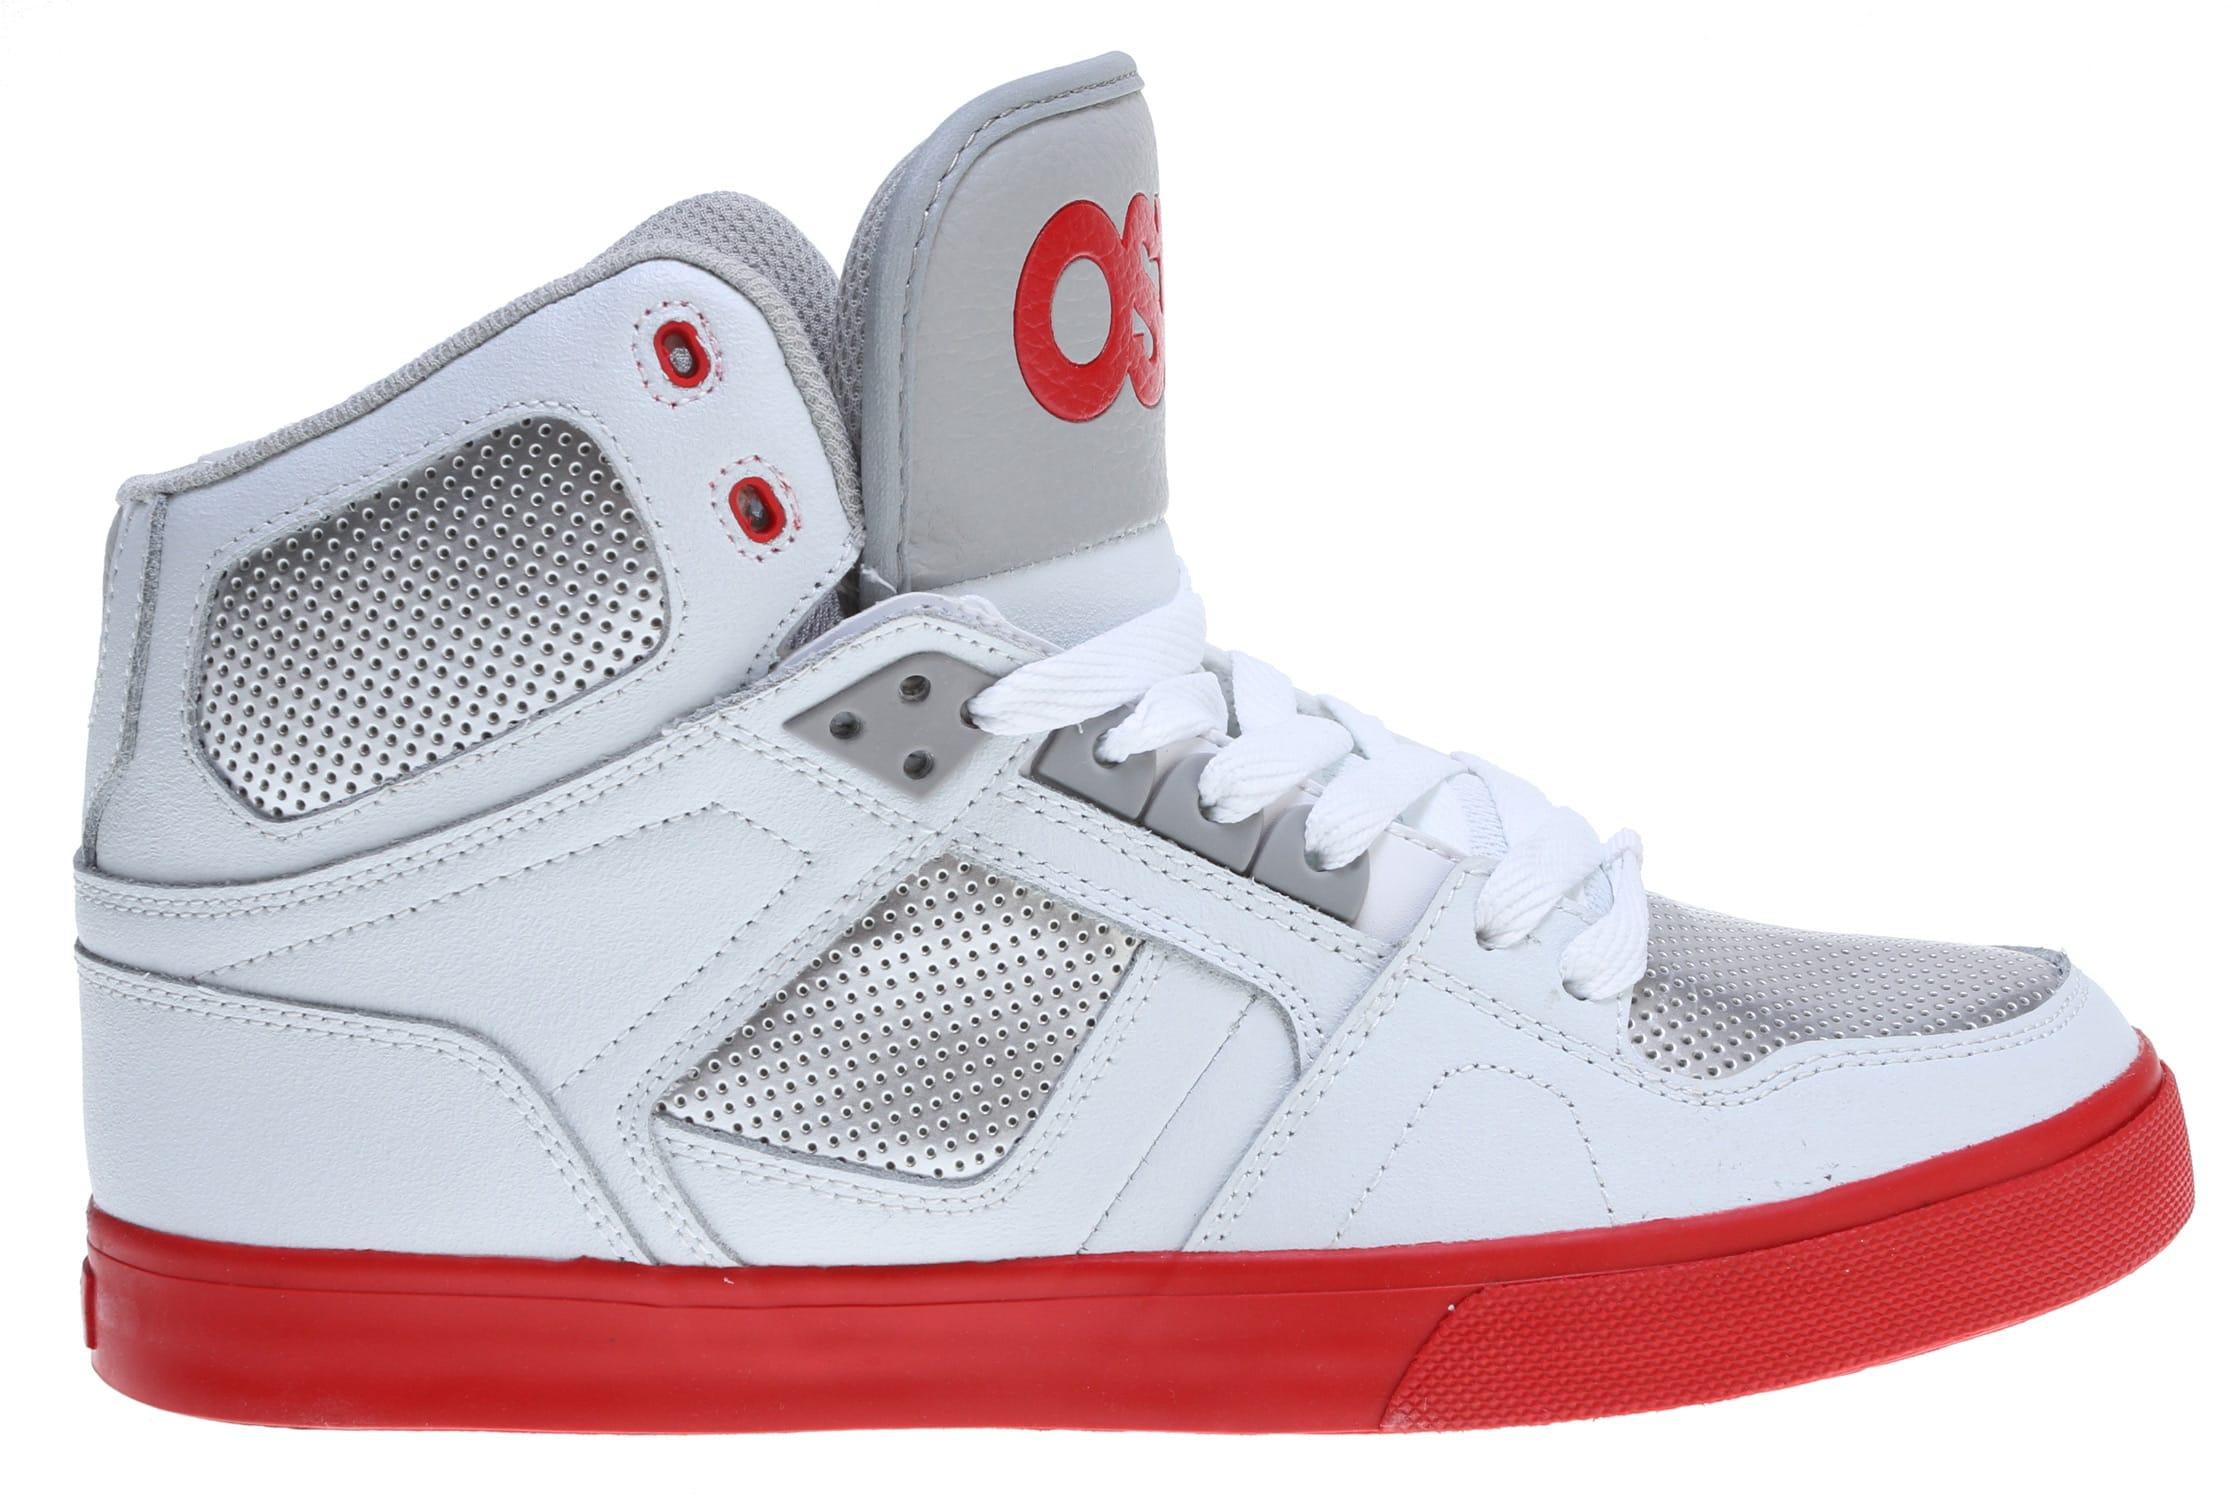 Osiris NYC 83 SLM Skate Shoes for Women